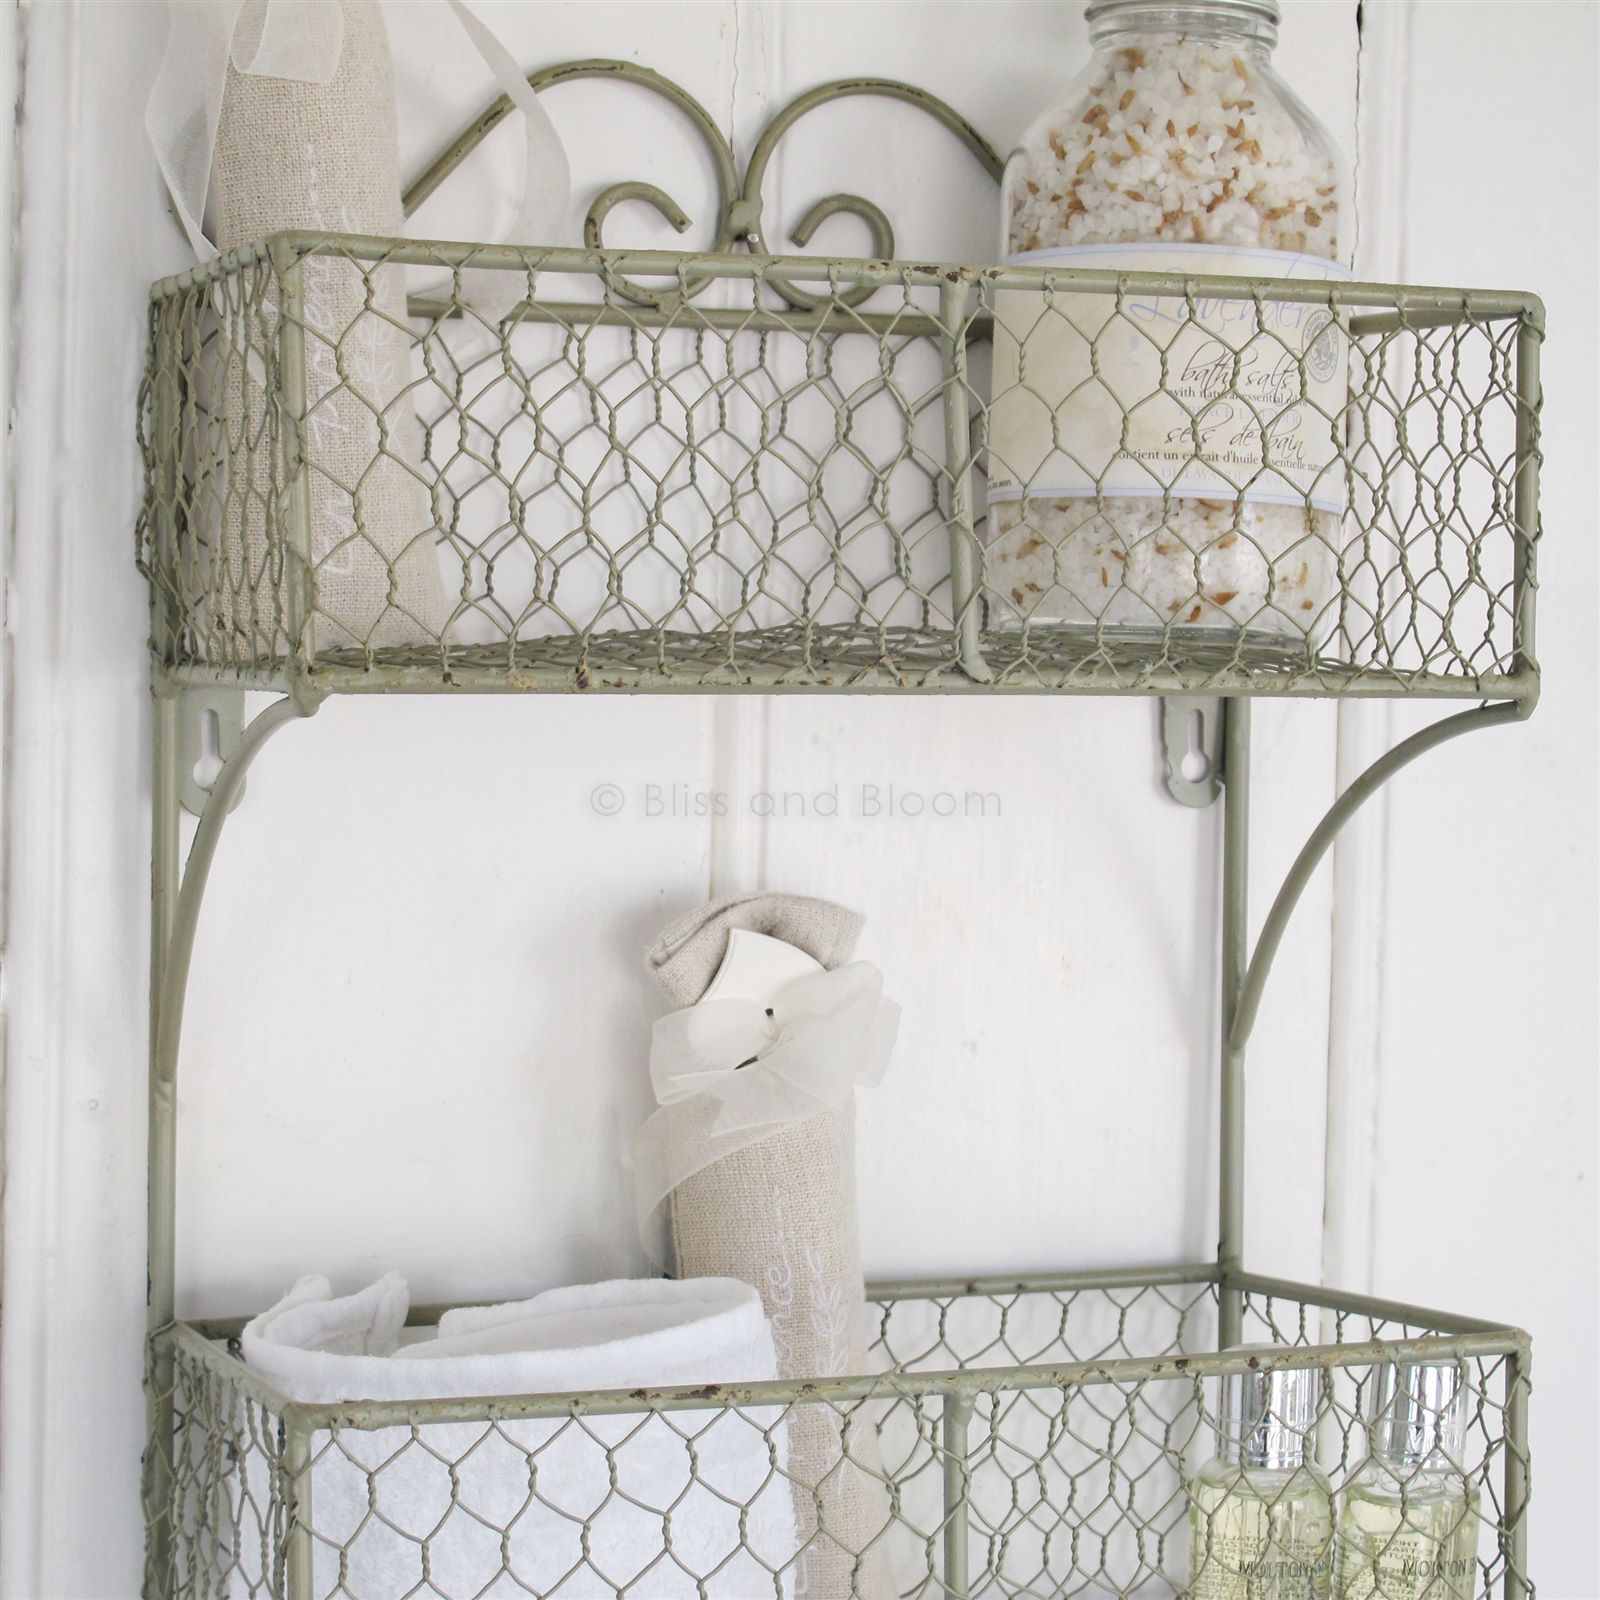 Double Wall Shelf Towel Rail | Bliss and Bloom Ltd | מדף ברזל ...